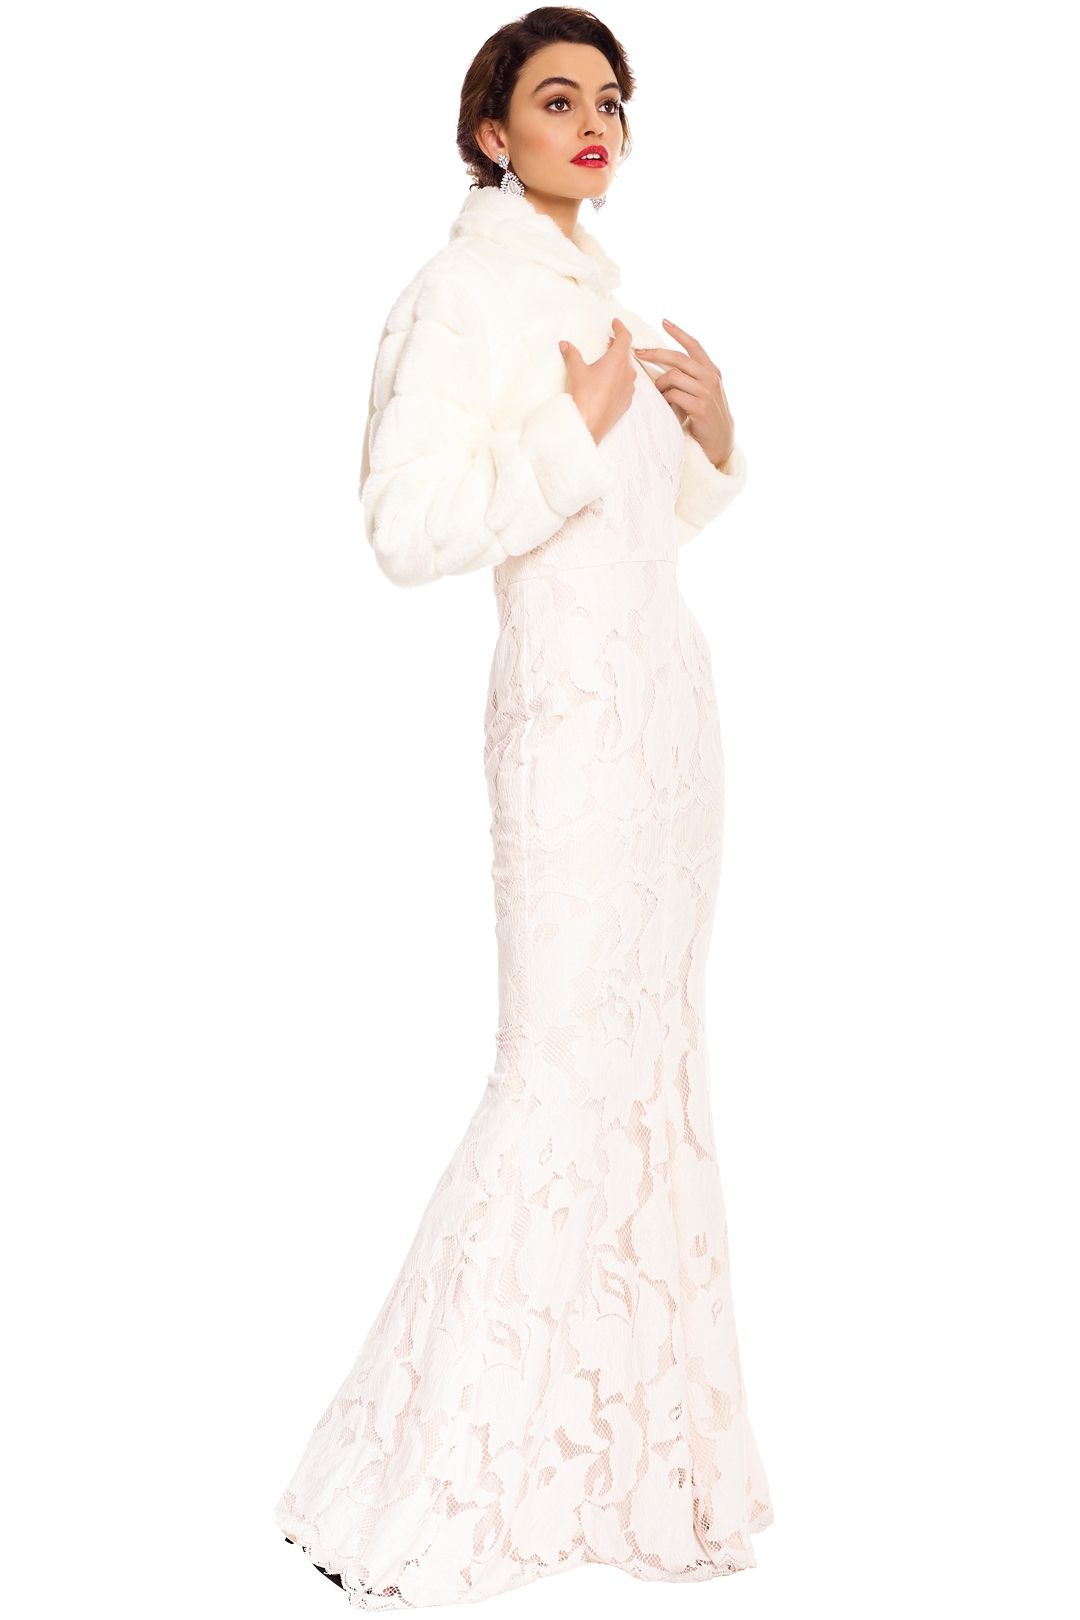 Tulip Bridal - Fayth Bolero - Ivory - Side